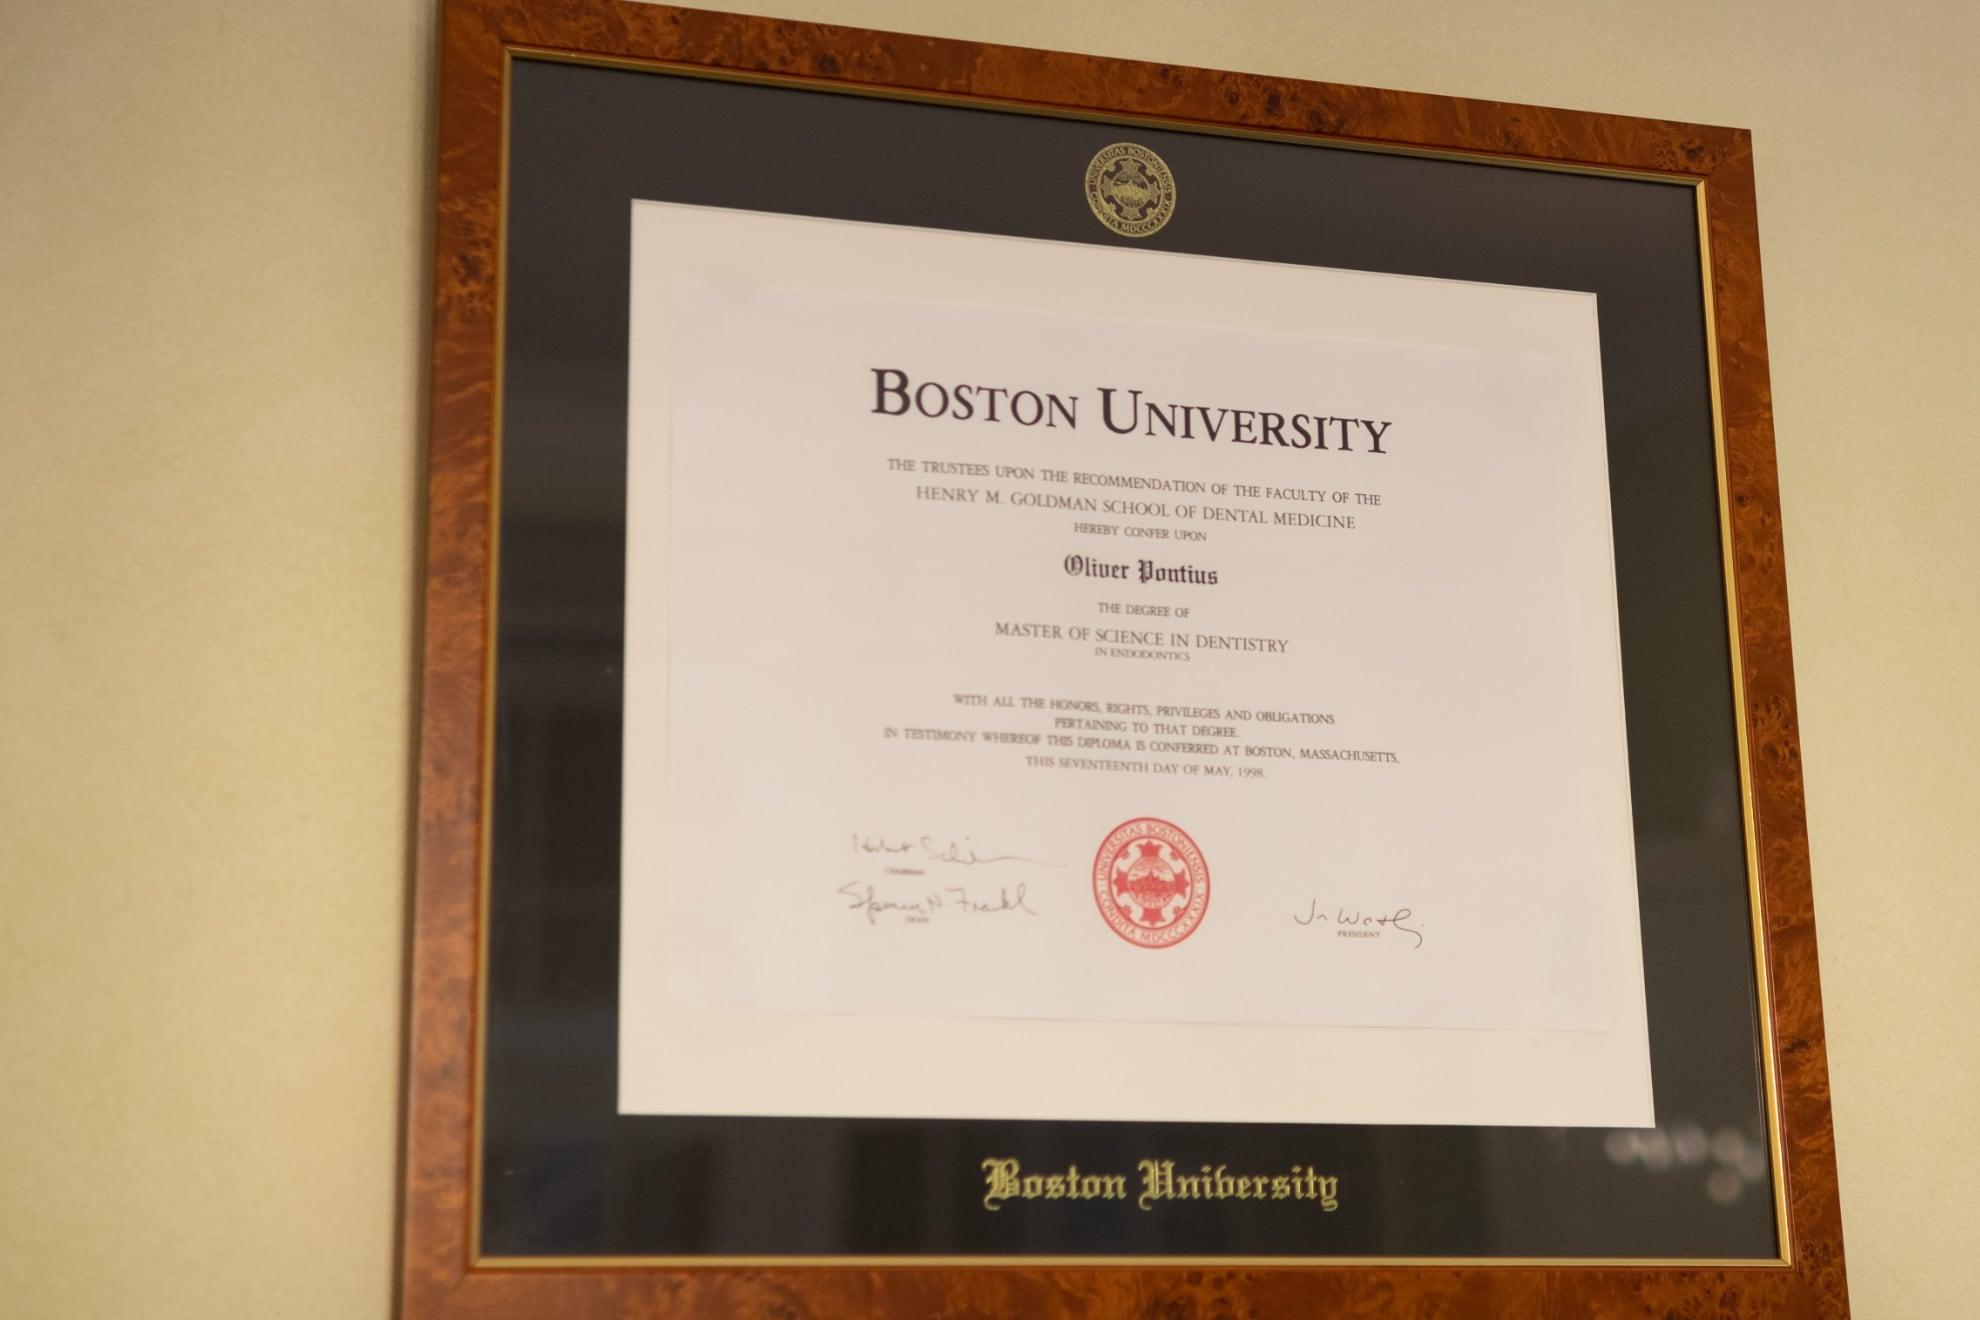 Praxis Dr. Oliver Pontius, Bad Homburg, Boston University